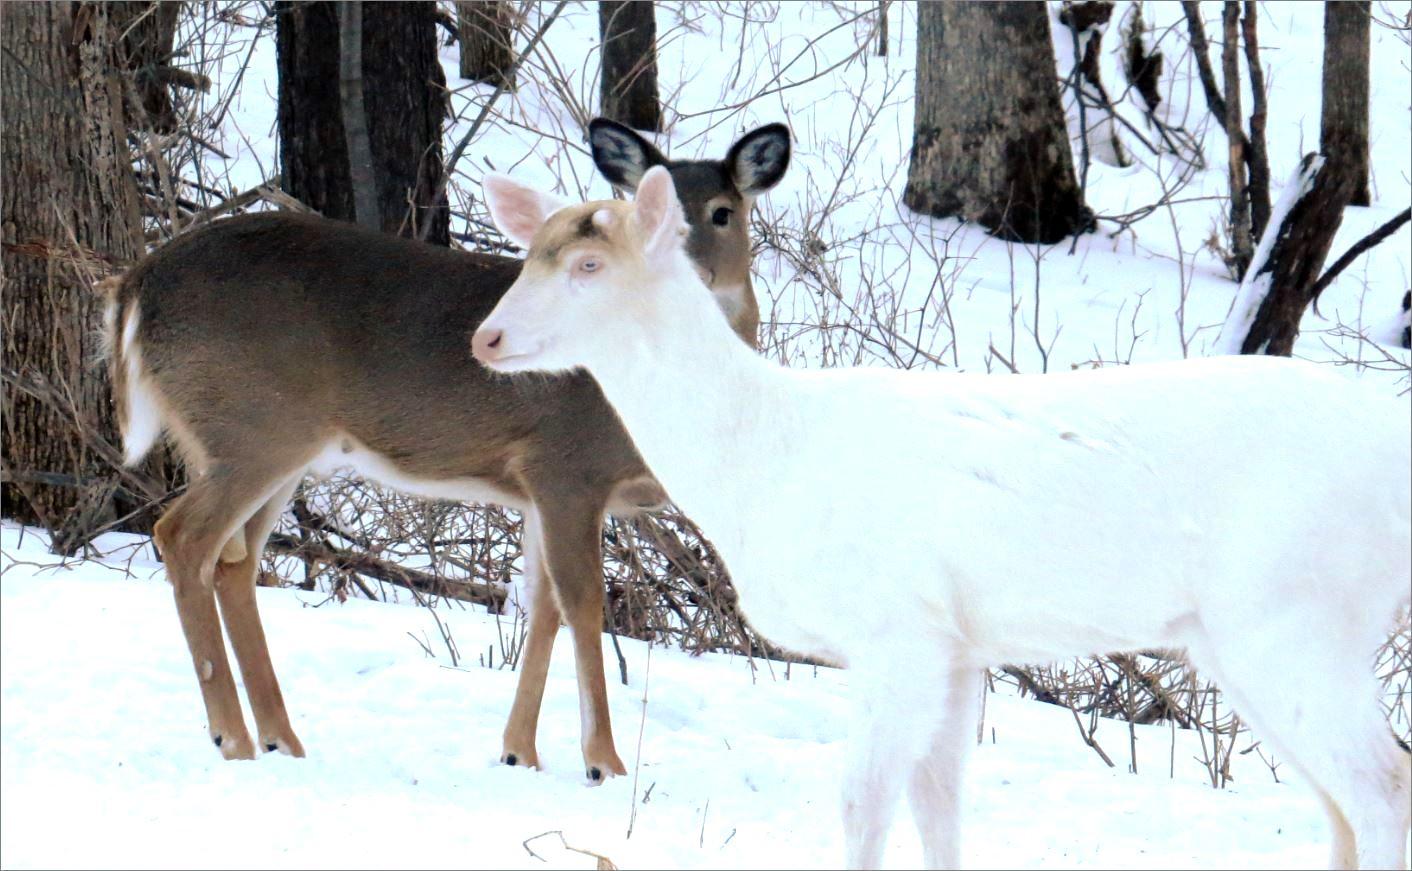 2 deer (one albino)